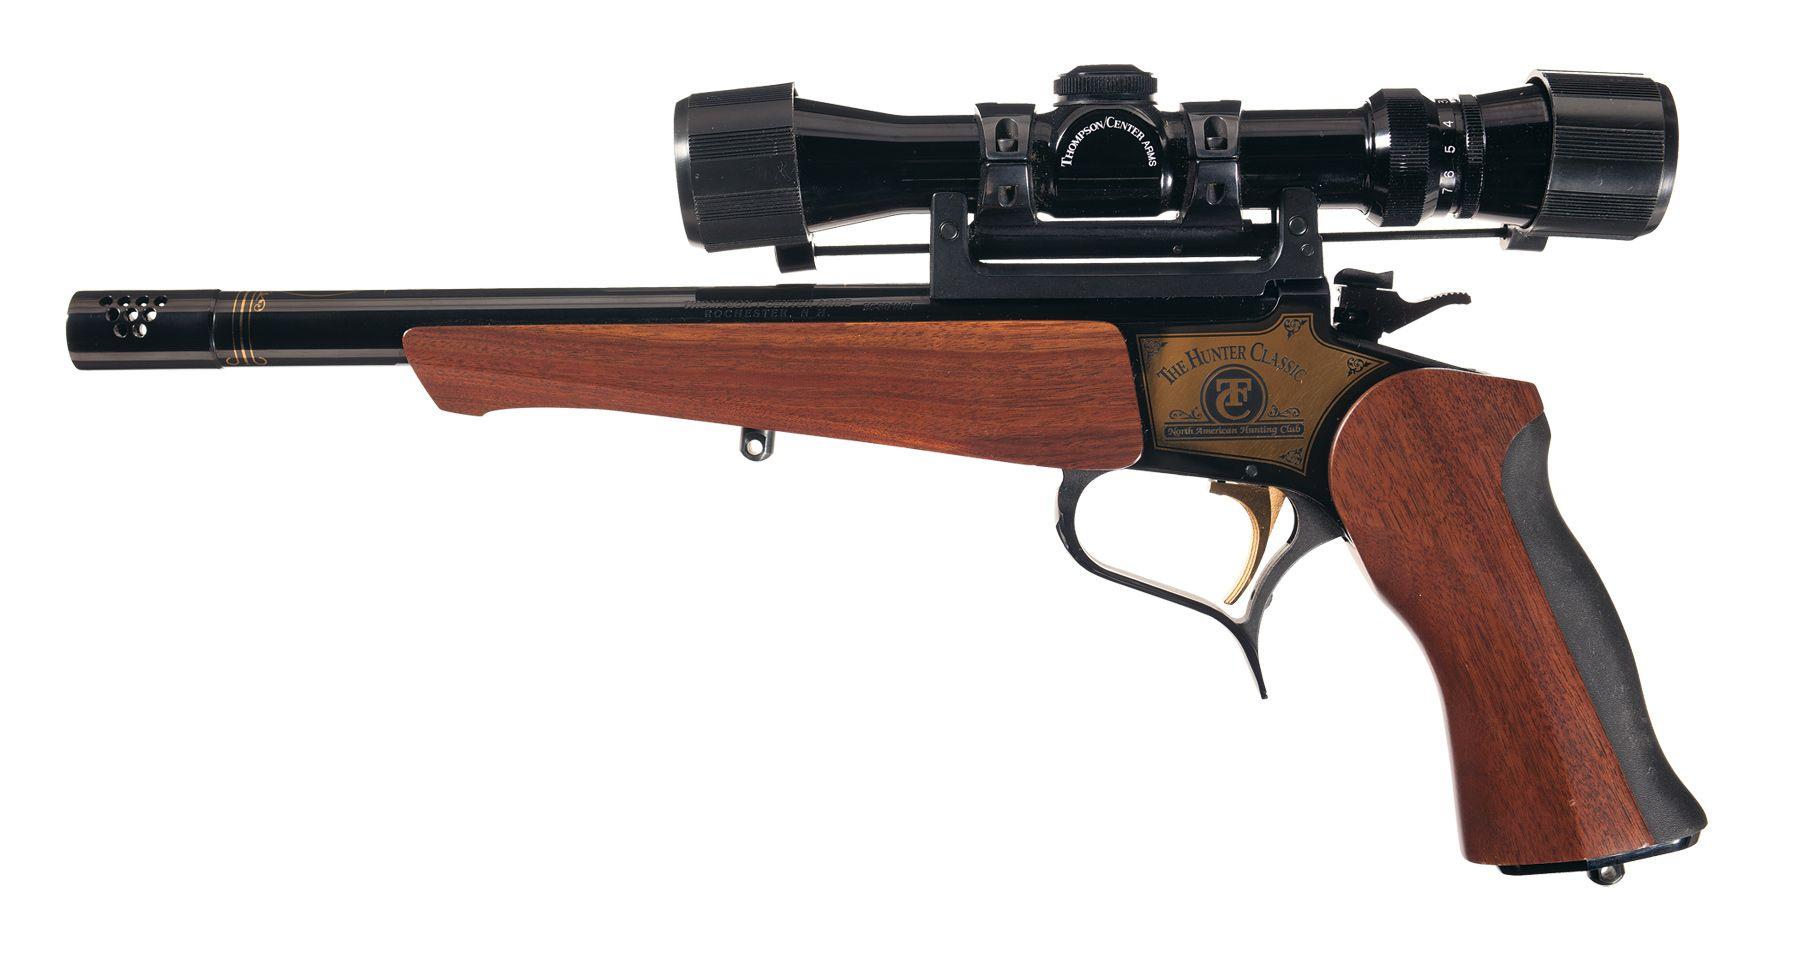 Thompson Center Contender Single Shot Pistol With Scope